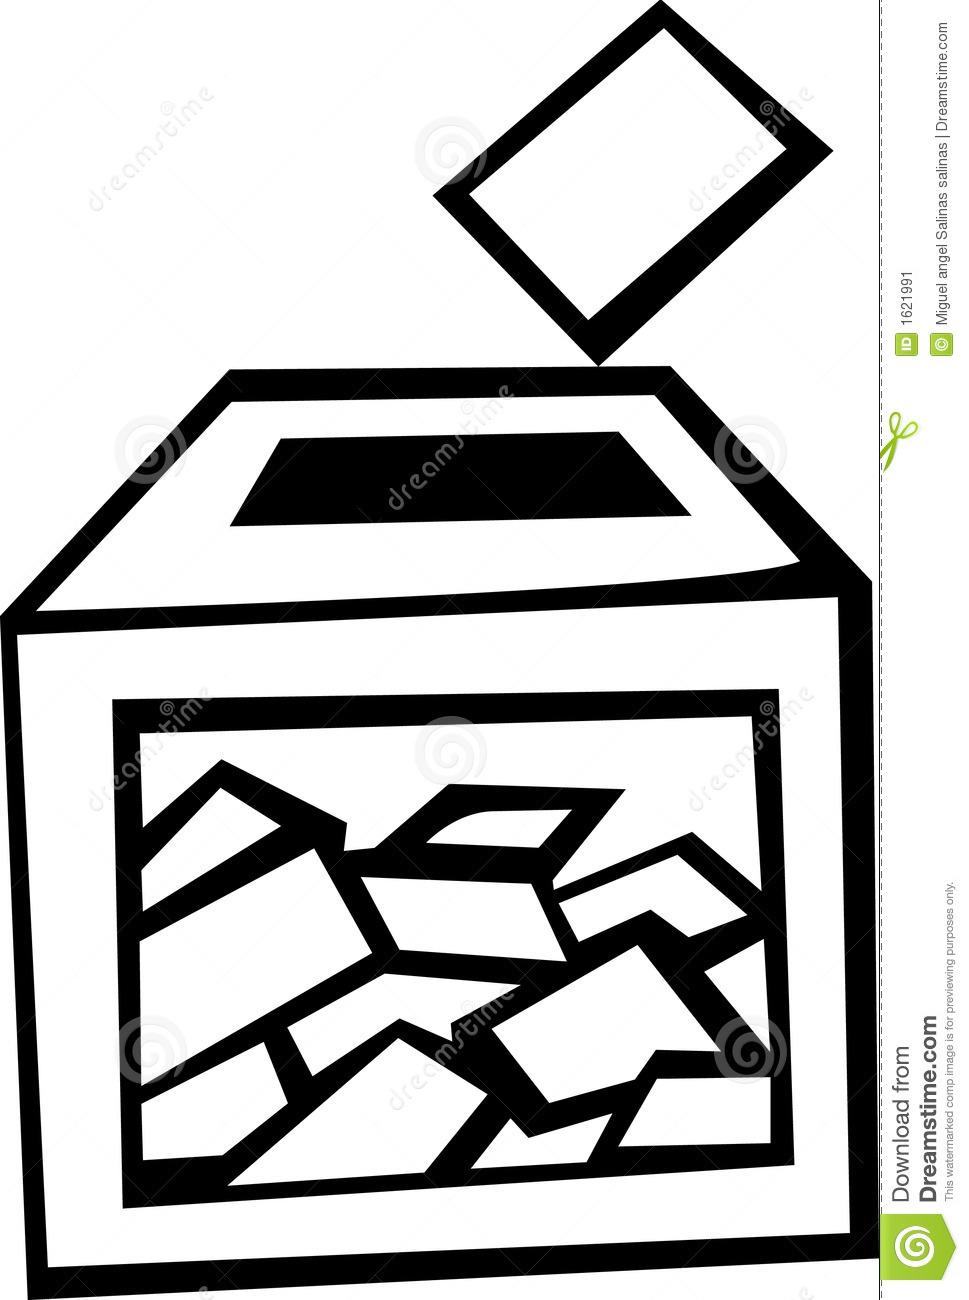 Voting Cartoon Clipart Clipart Suggest